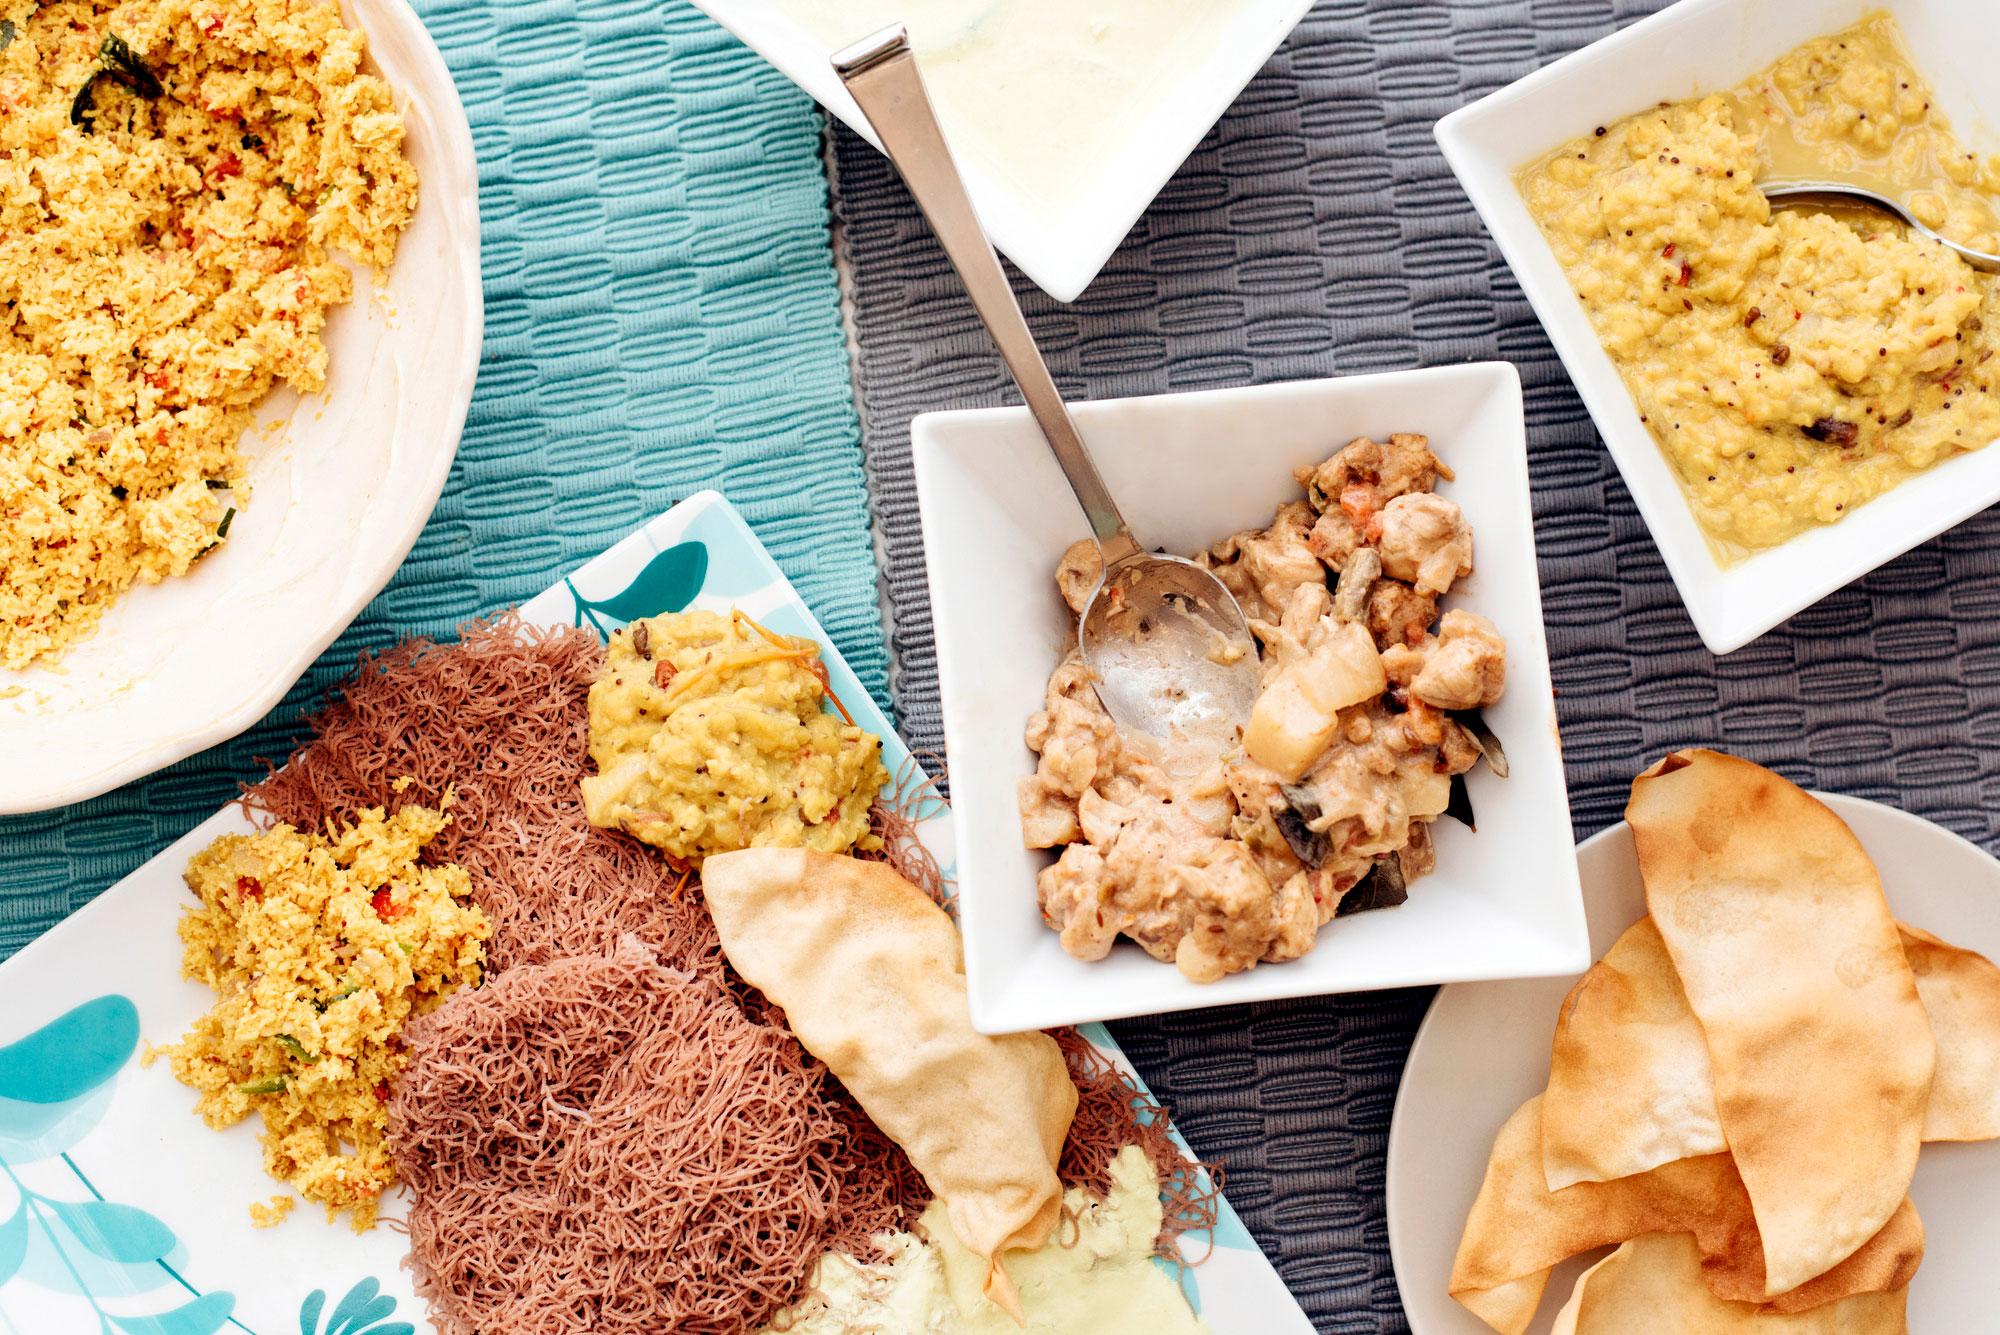 Los_Angeles_Food_photographer_Rebecca_Peloquin_Sri_Lankan_Food_025.JPG